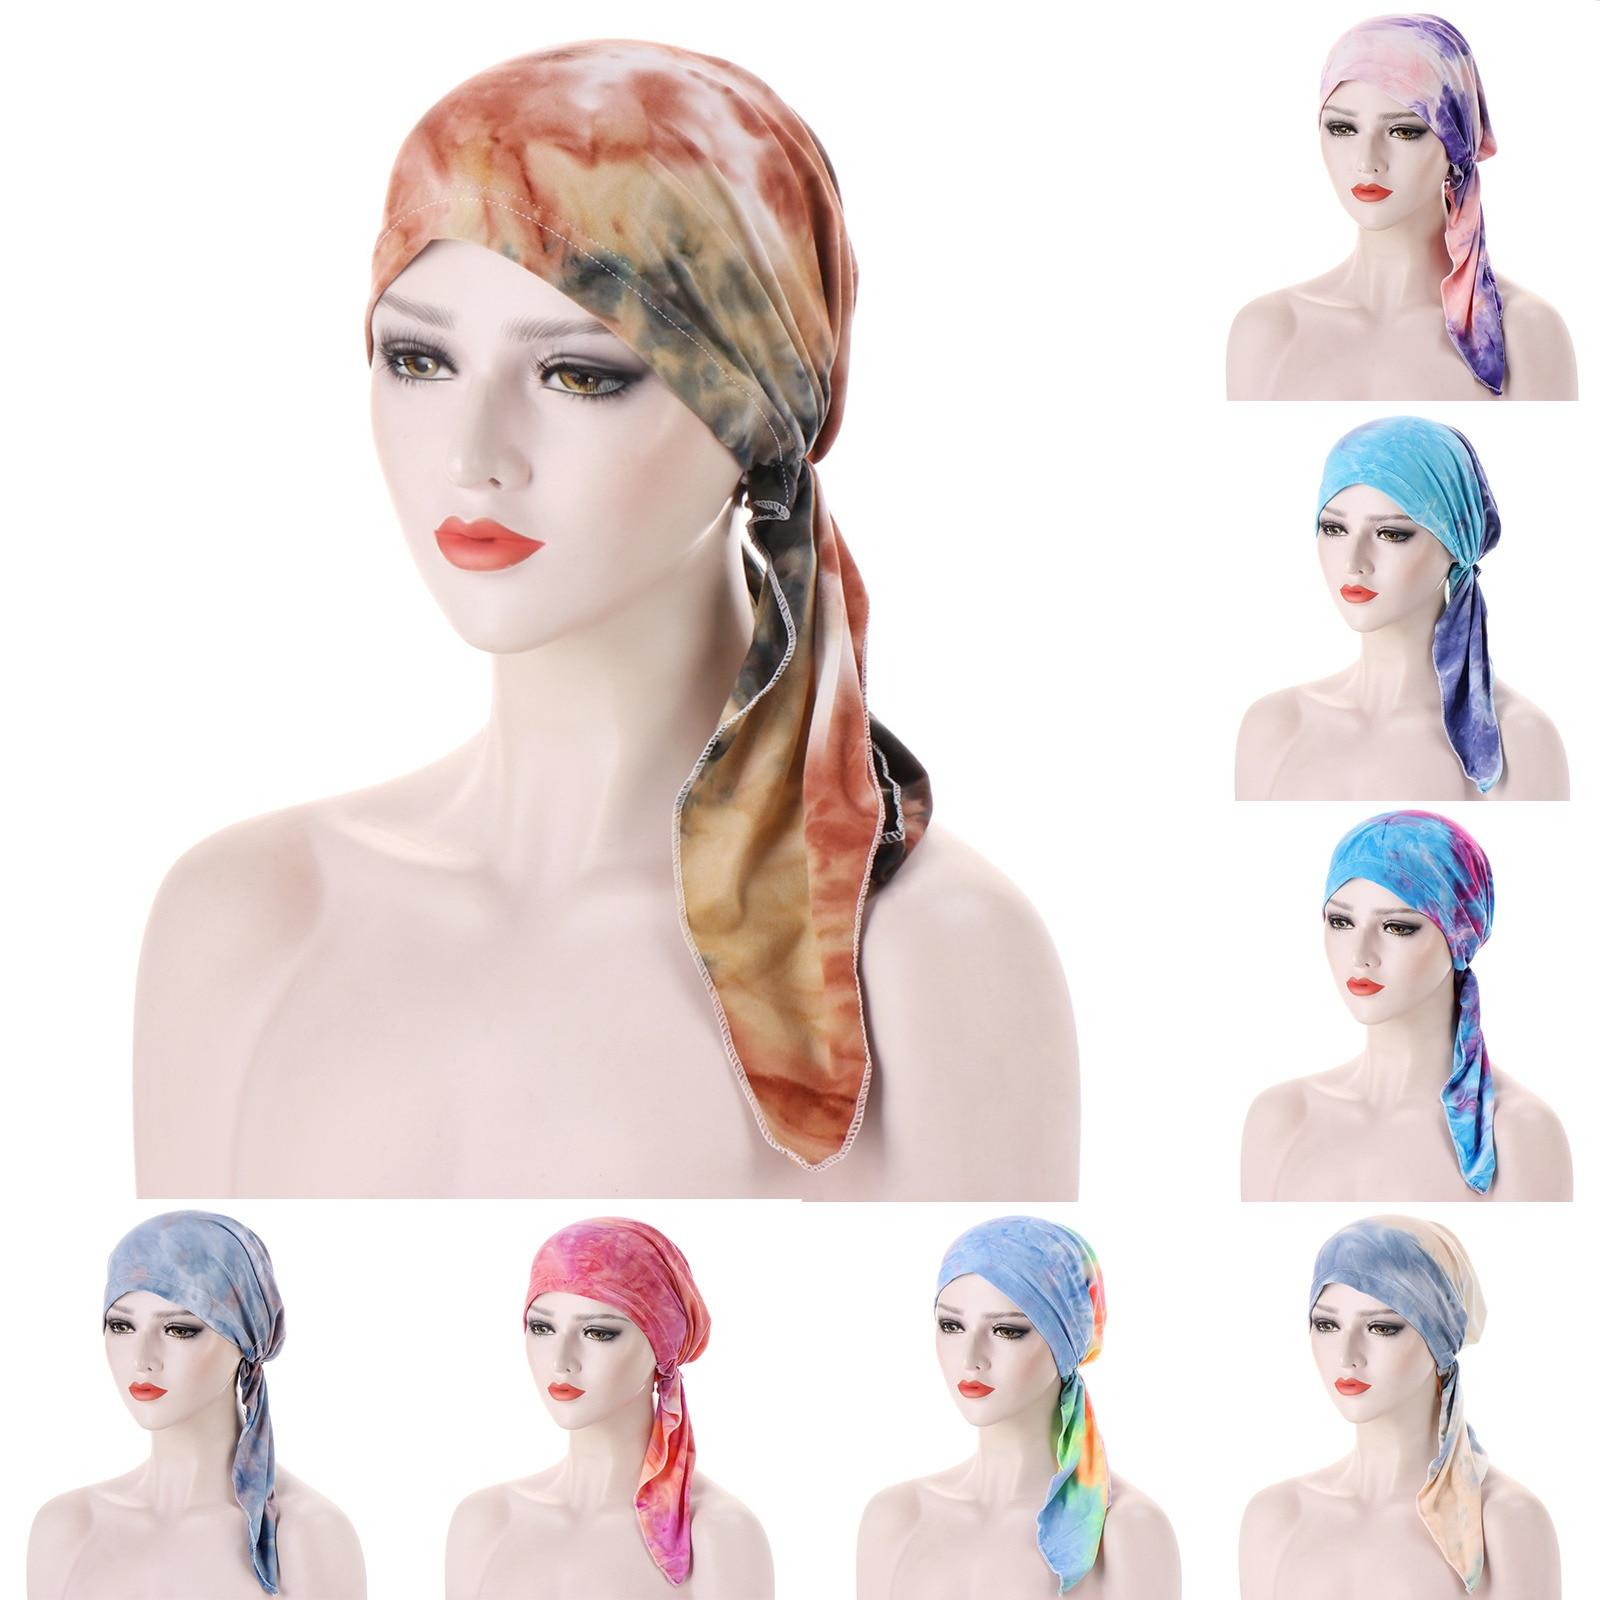 New Women Fashion Hijab Cancer Chemo Muslim Tie-dye Hat Turban High-quality Head Cover Hair Loss Scarf Wrap Pre-tied Bandana